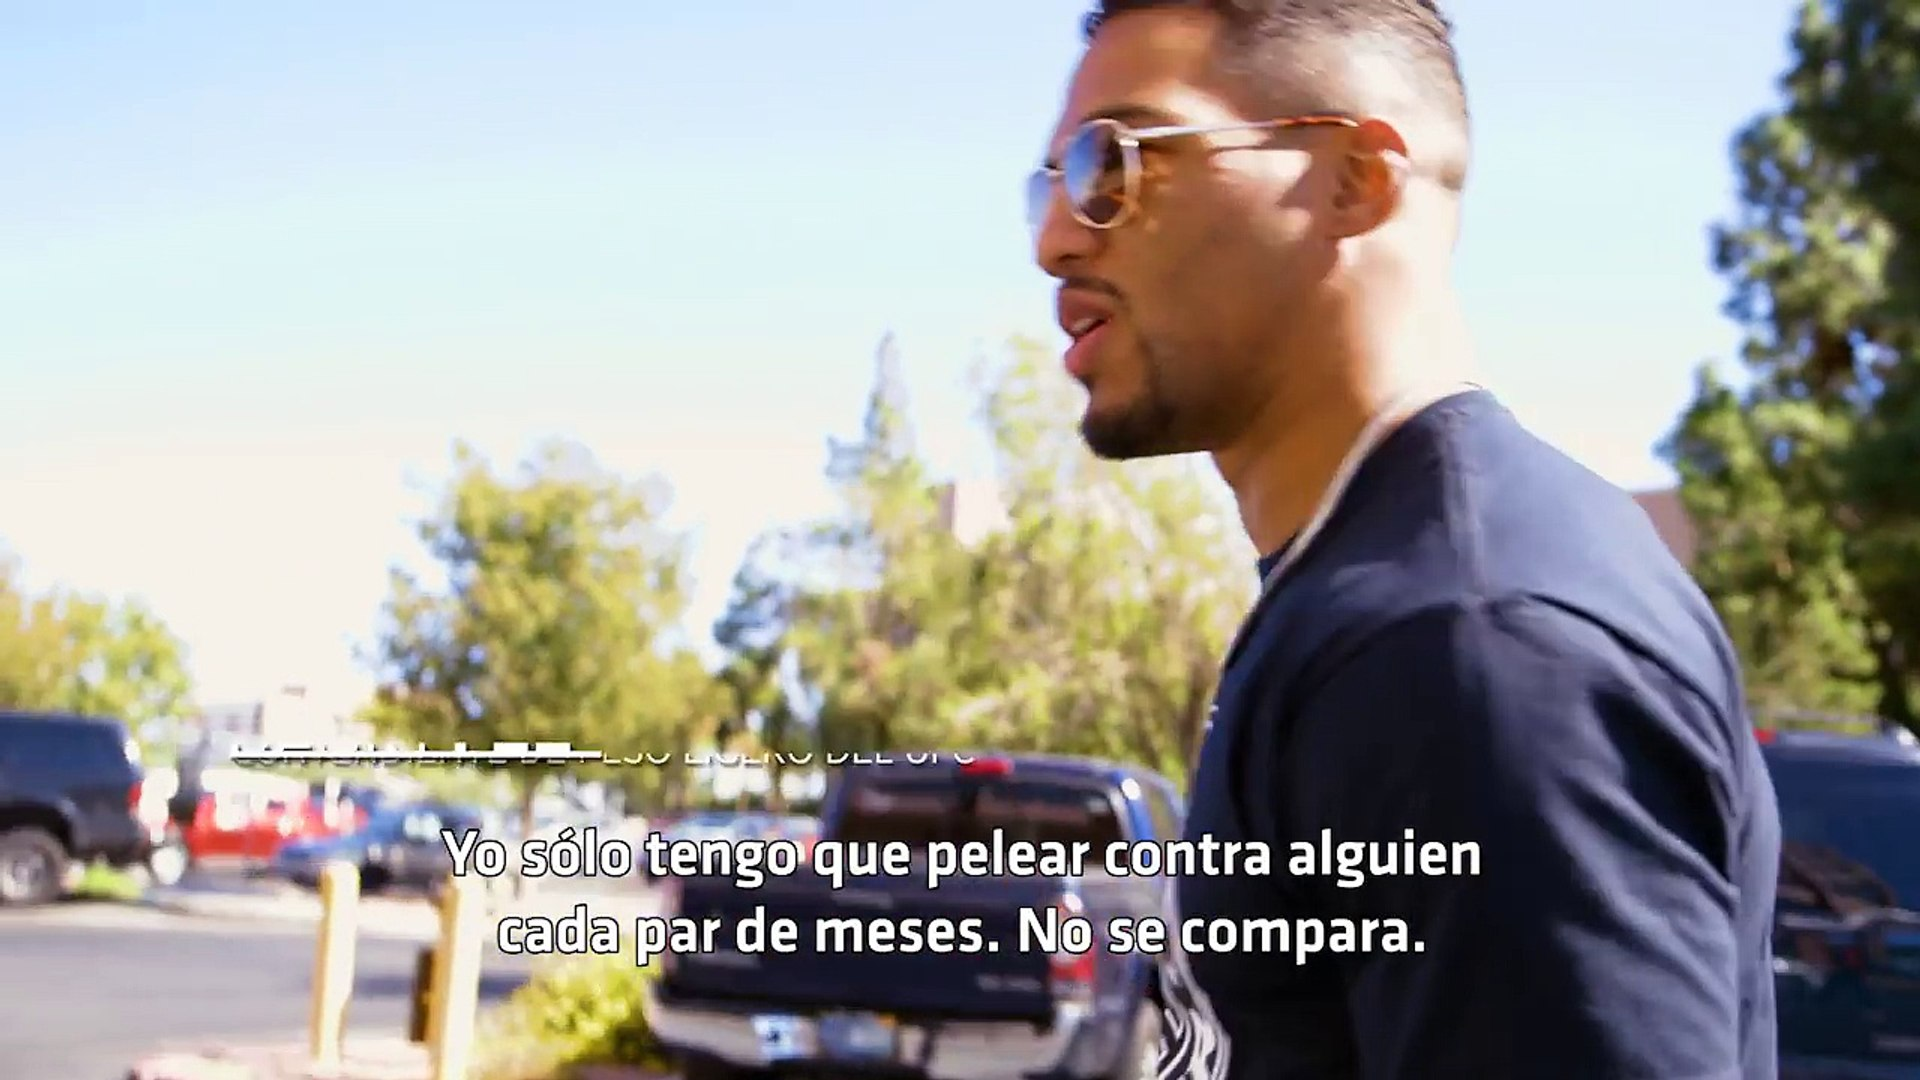 UFC 216 Embedded: Vlog Series - Episodio 4 Español